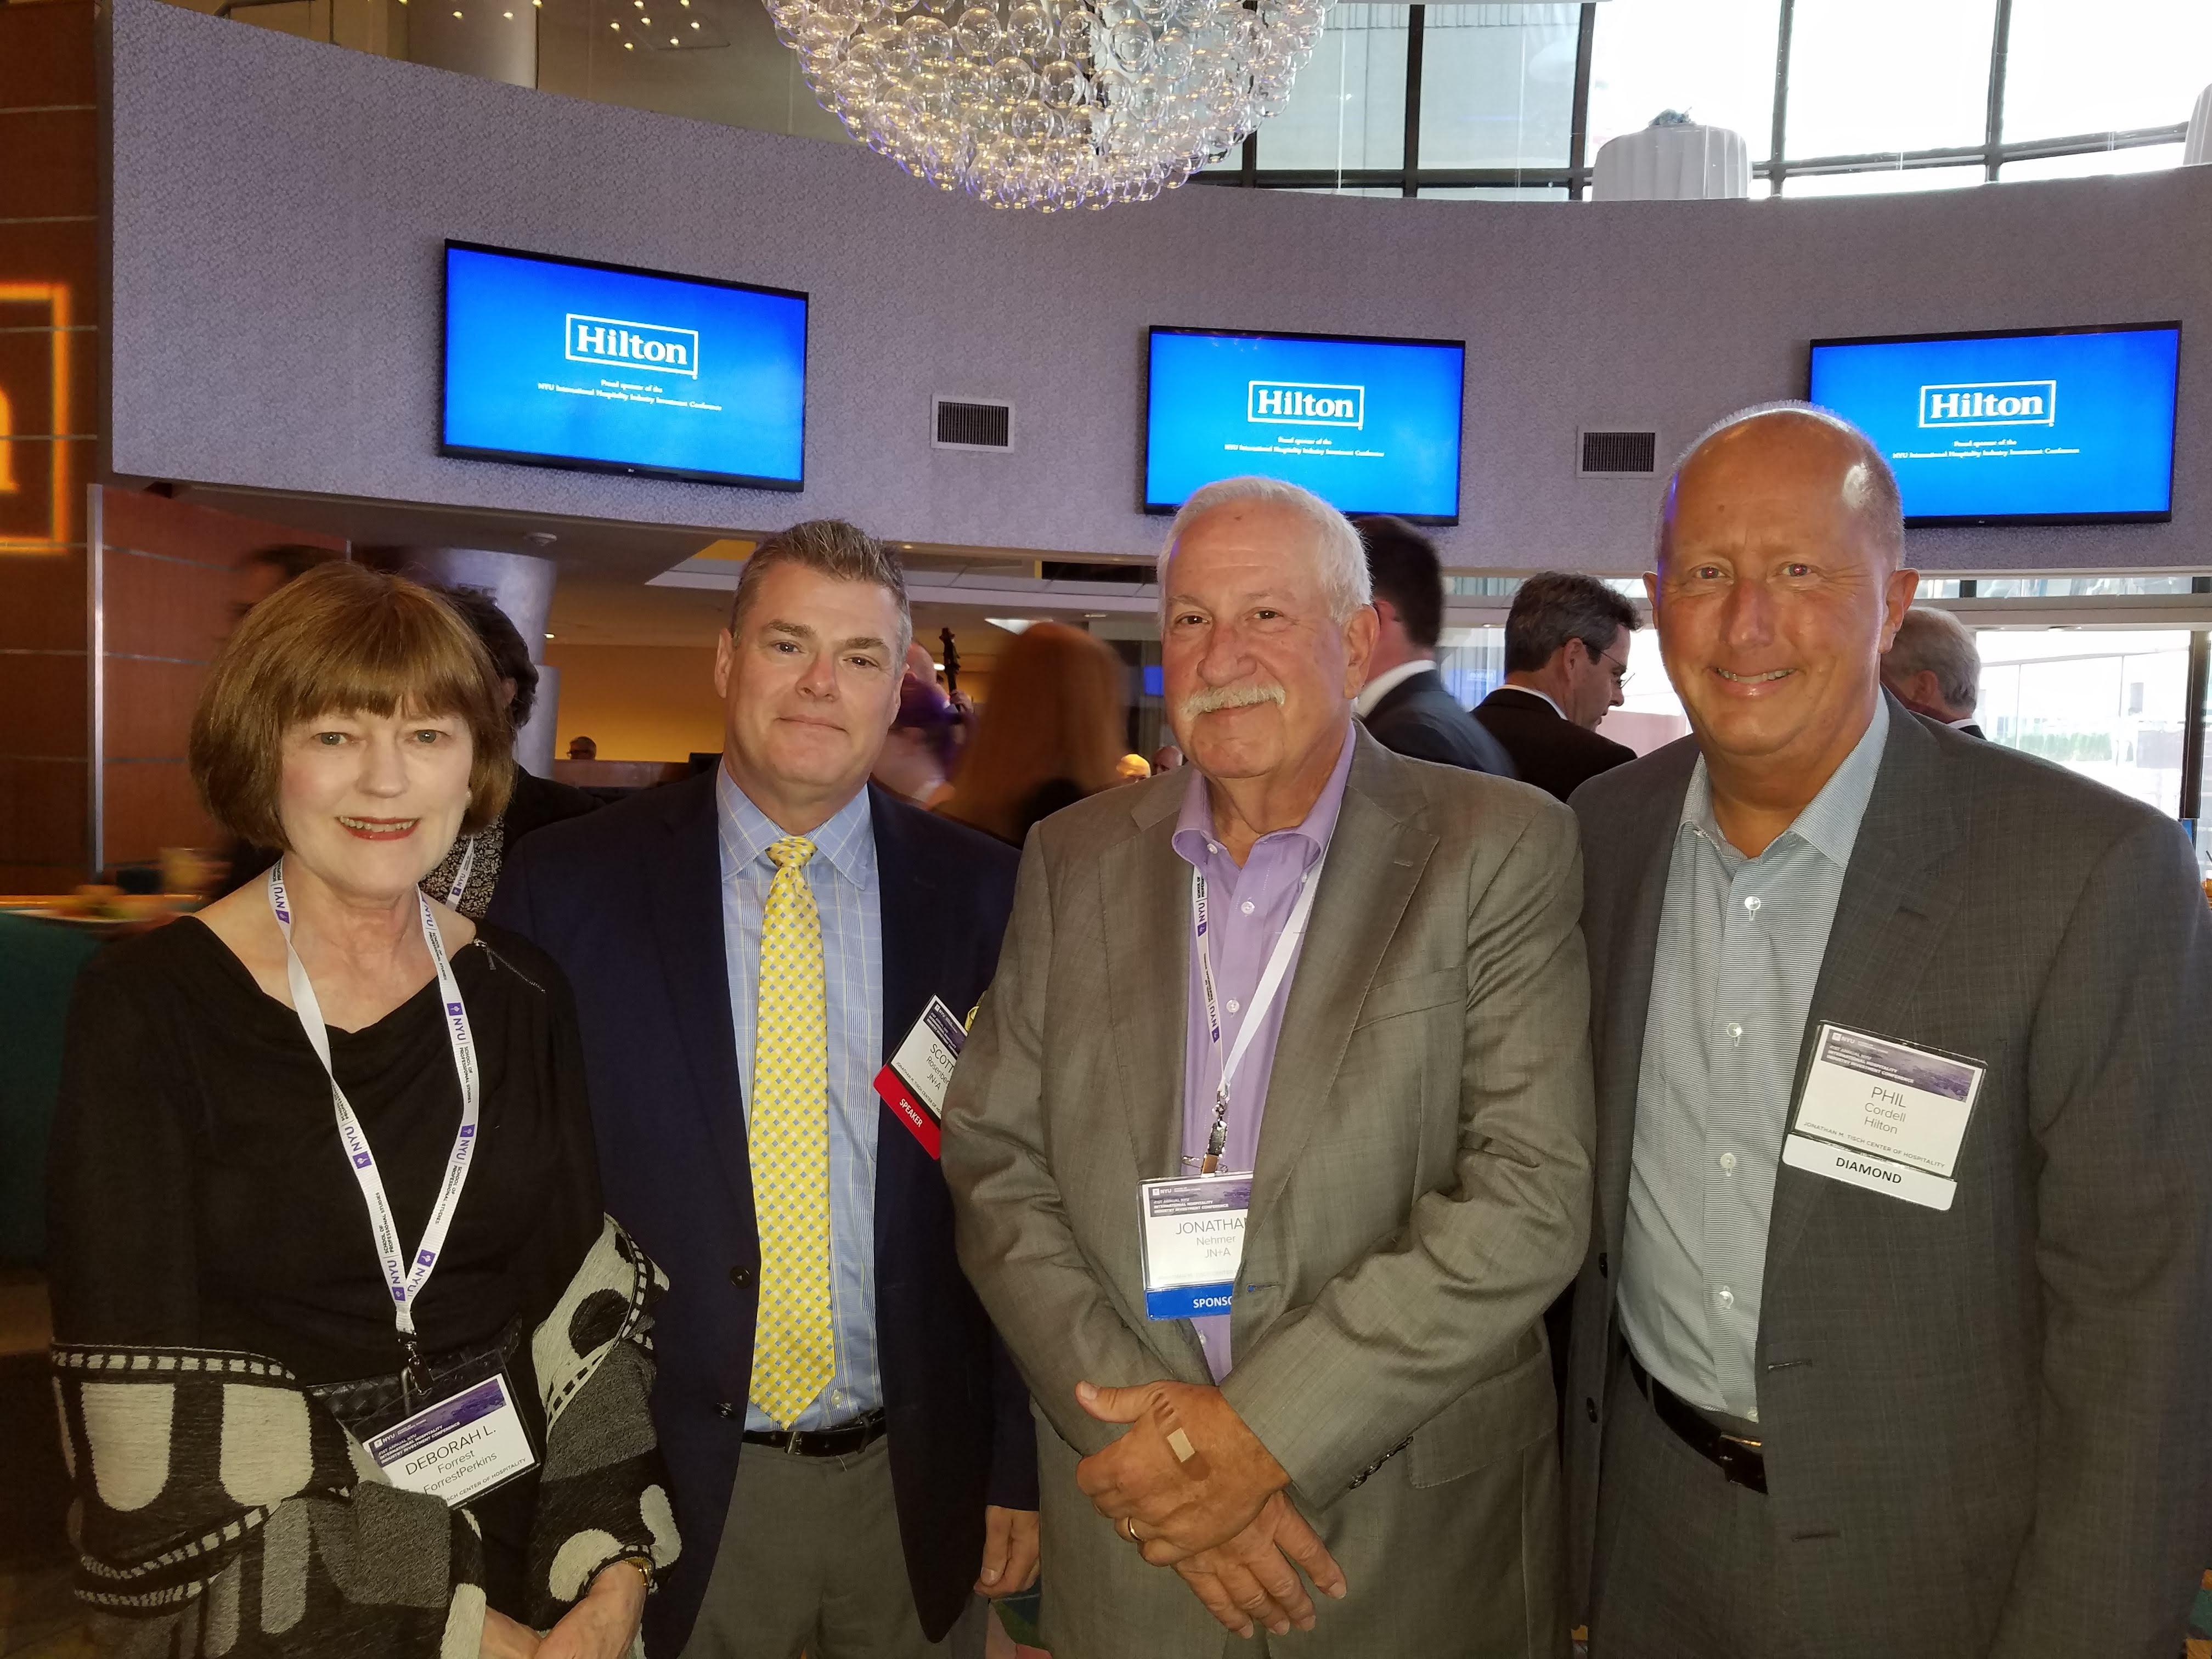 From left: Deborah L. Forrest, founder of ForrestPerkins; Scott Rosenberg, president of Jonathan Nehmer + Associates, Inc. (JN+A); Jonathan Nehmer, chairman and founder of JN+A; and Phil Cordell, global head of new brand development, Hilton